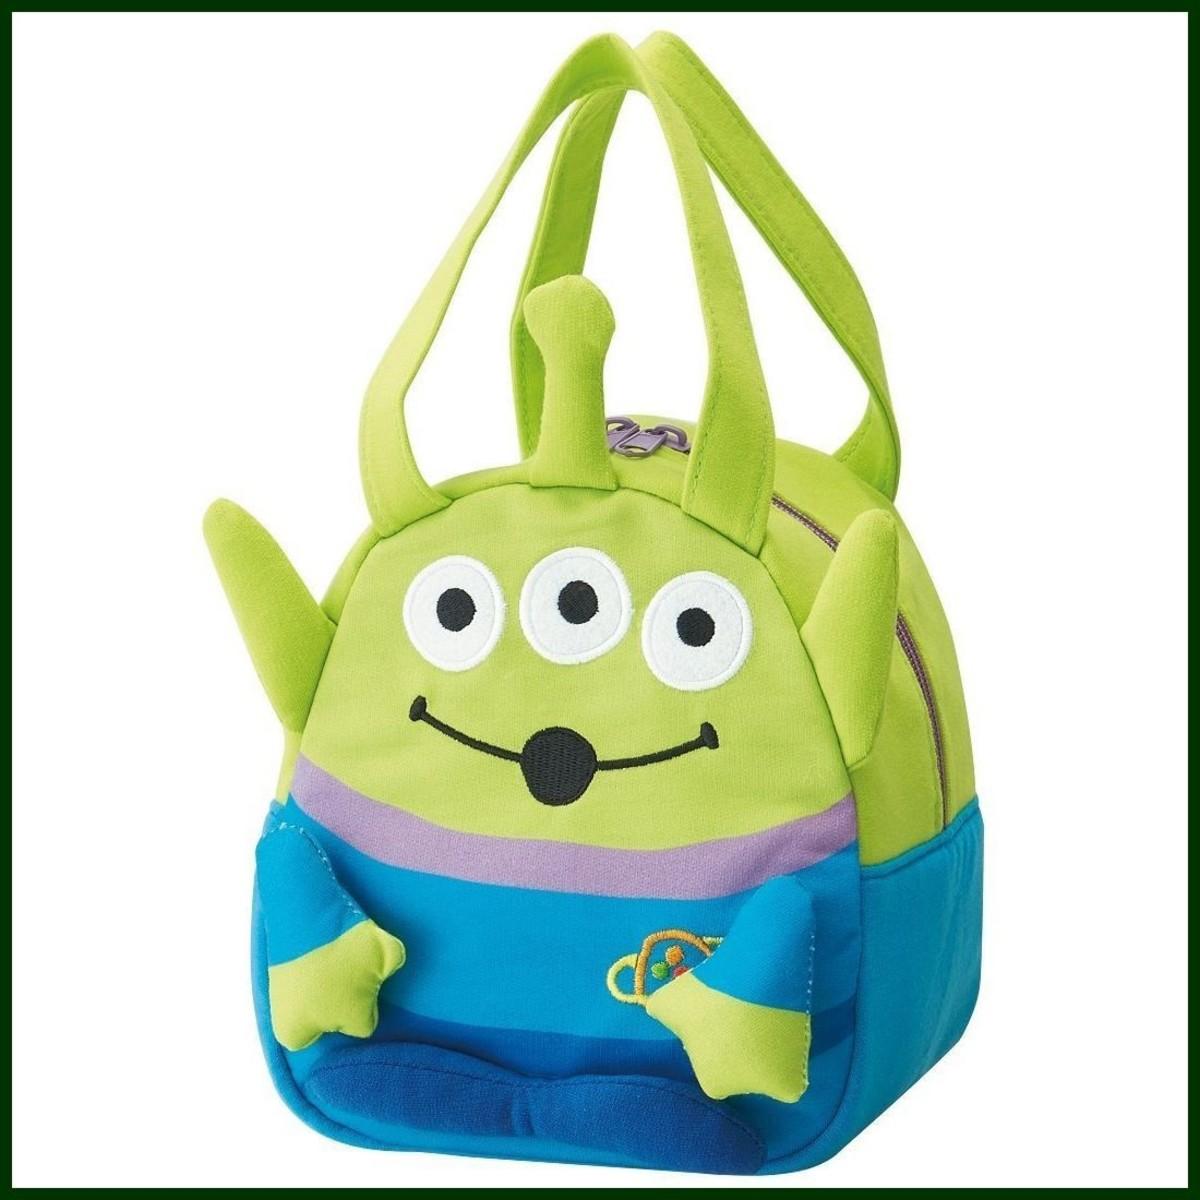 (Toy Story Alien) Japan Disney Kid's Lovely Cartoon Handbag